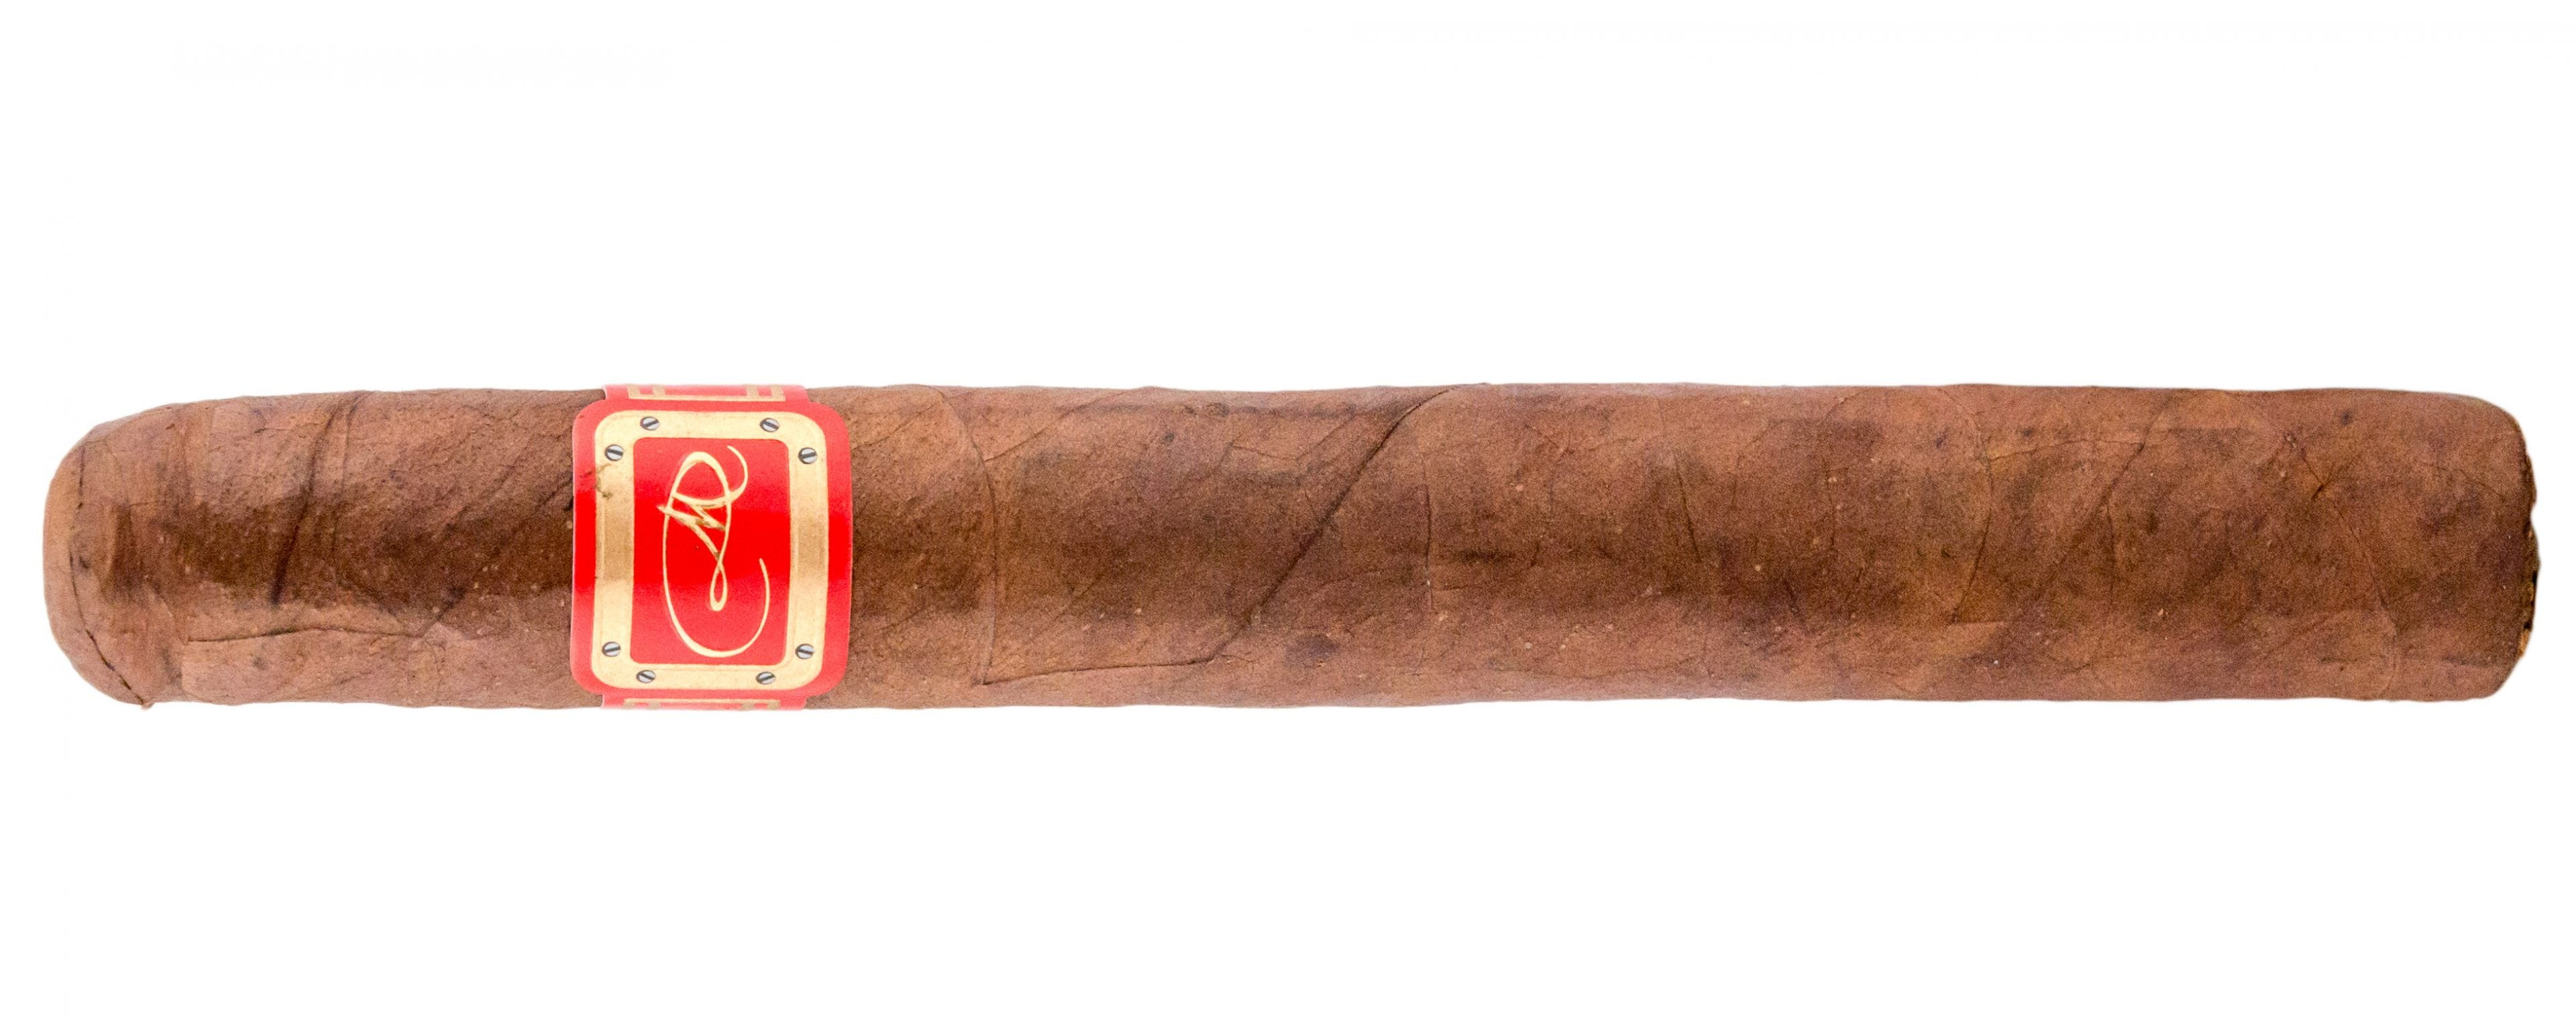 Blind Cigar Review: Daniel Marshall   DM2 Red Label Corona